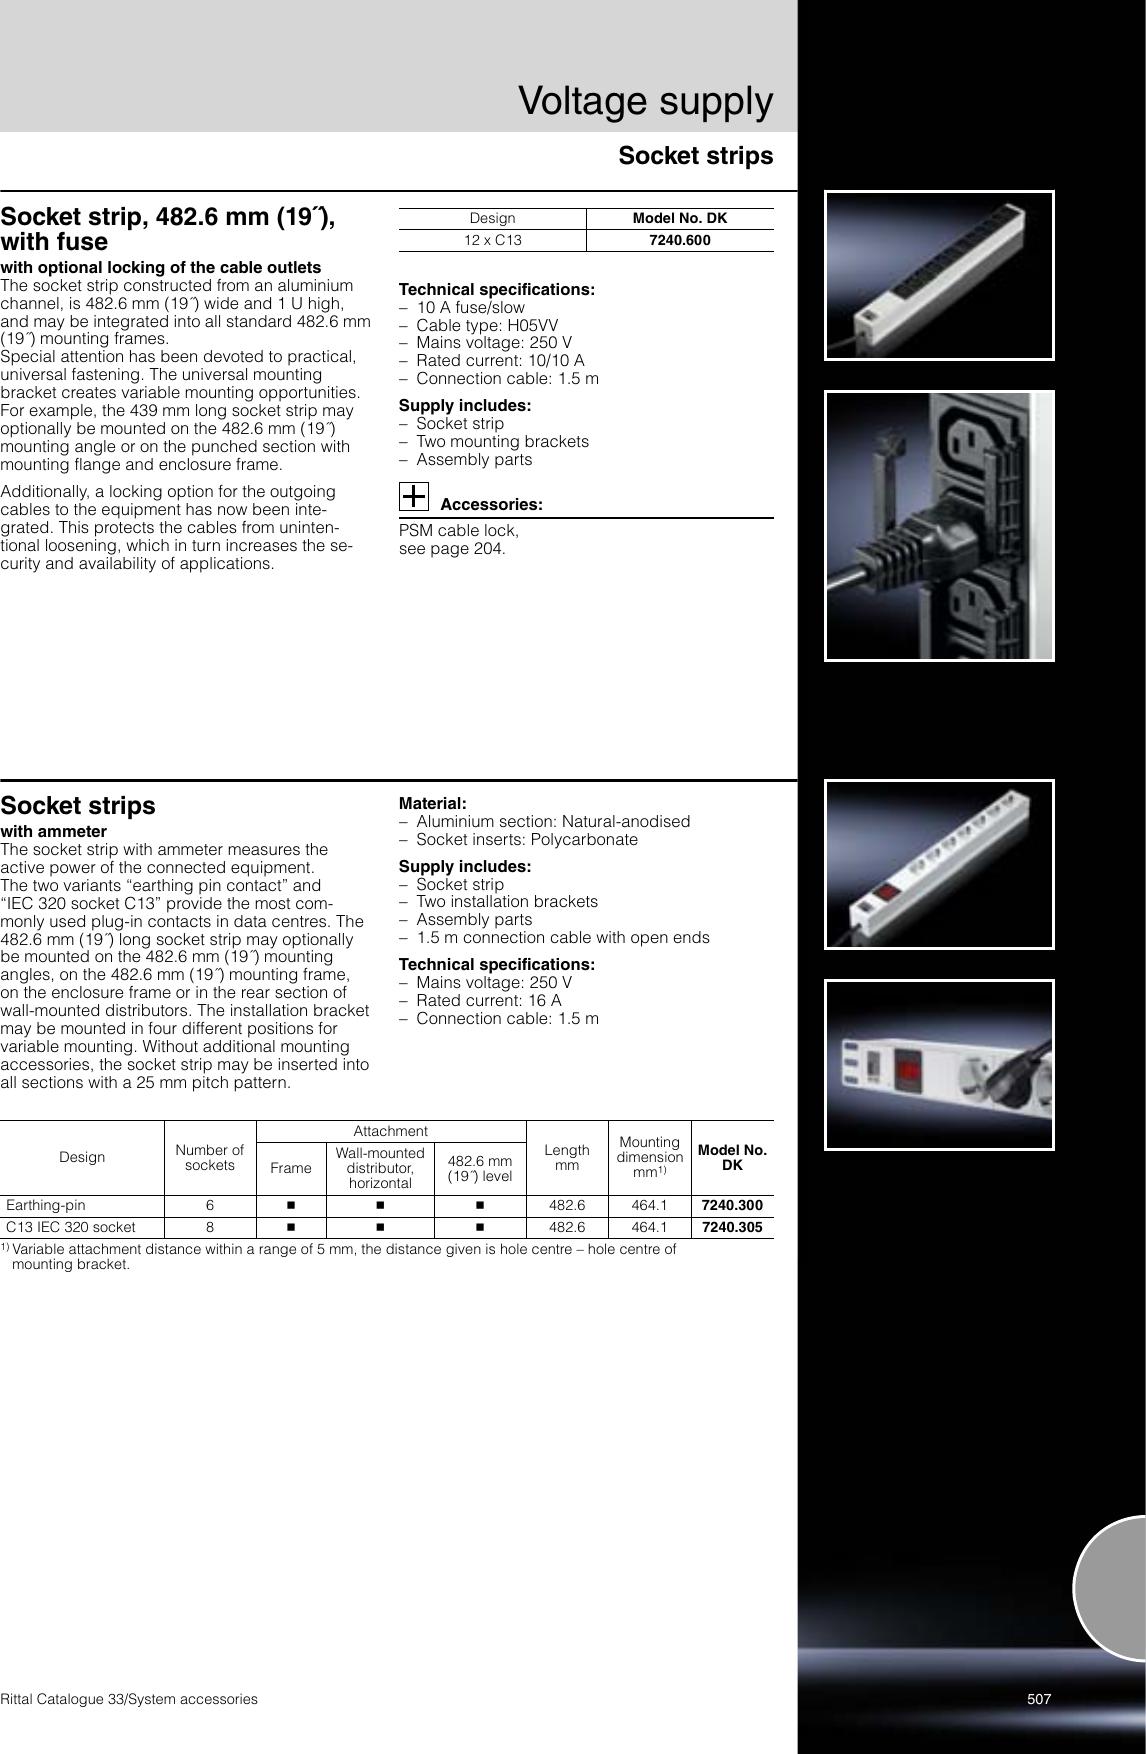 Handbuch_33_apm 467484 Catalog